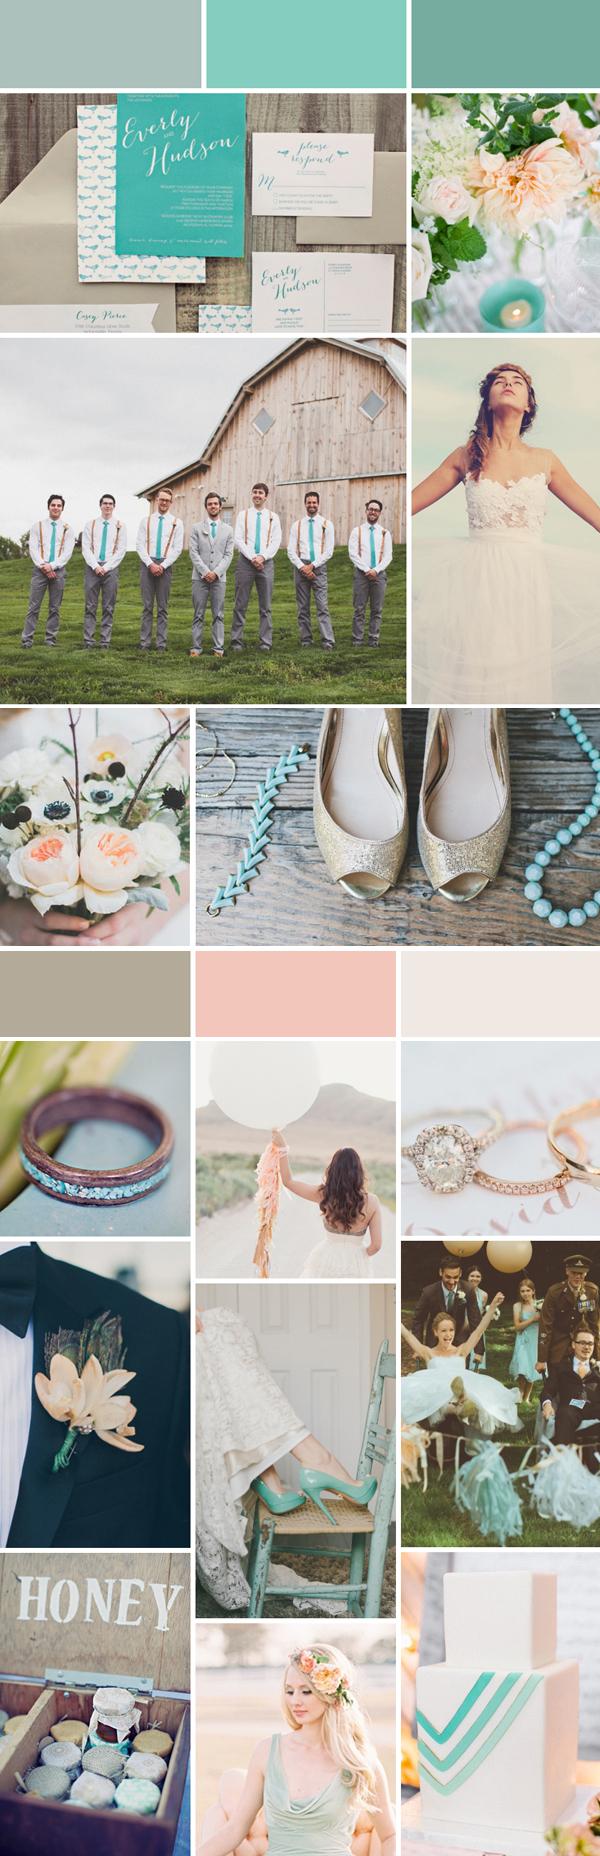 SomethingTurquoise_CarlyRaeWeddings_Turquoise_Peach_inspiration_board